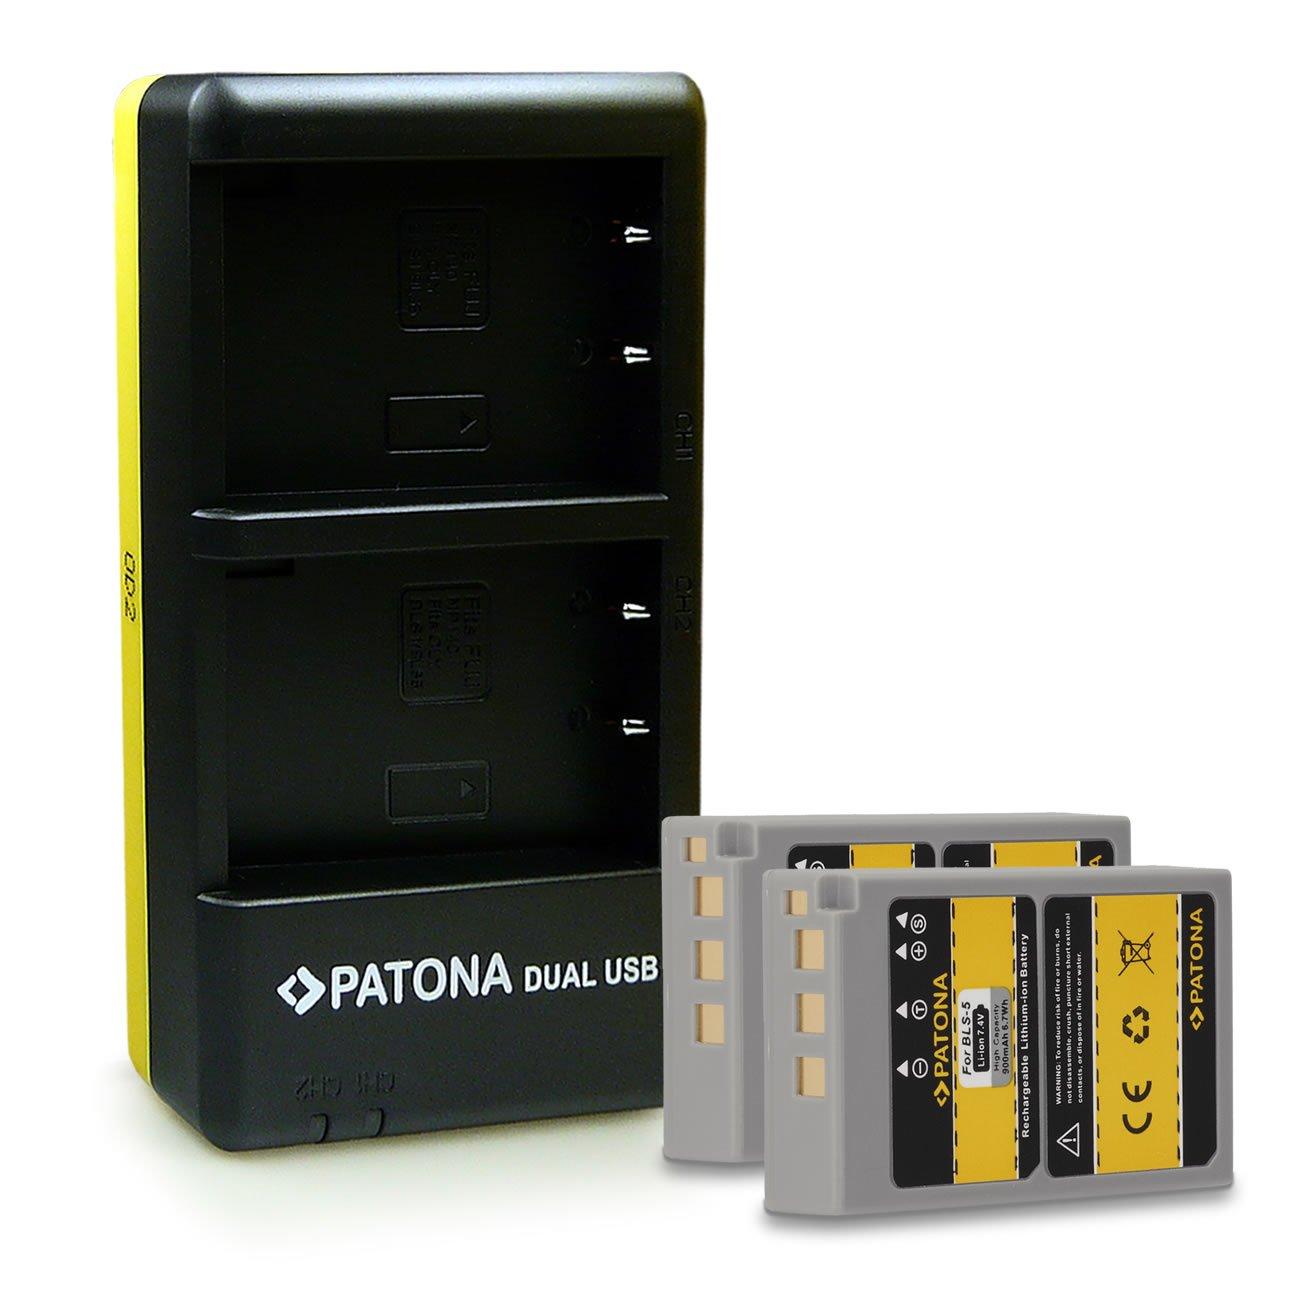 PATONA 2in1 Dual Caricabatteria con micro USB + 2x Batteria NP-W126 per Fuji X-T1 | X-E2 | X-M1 | X-E1 | X-Pro1 | X-A1 | X-T10 | X-A2 | FinePix HS50EXR | HS30EXR | HS33EXR